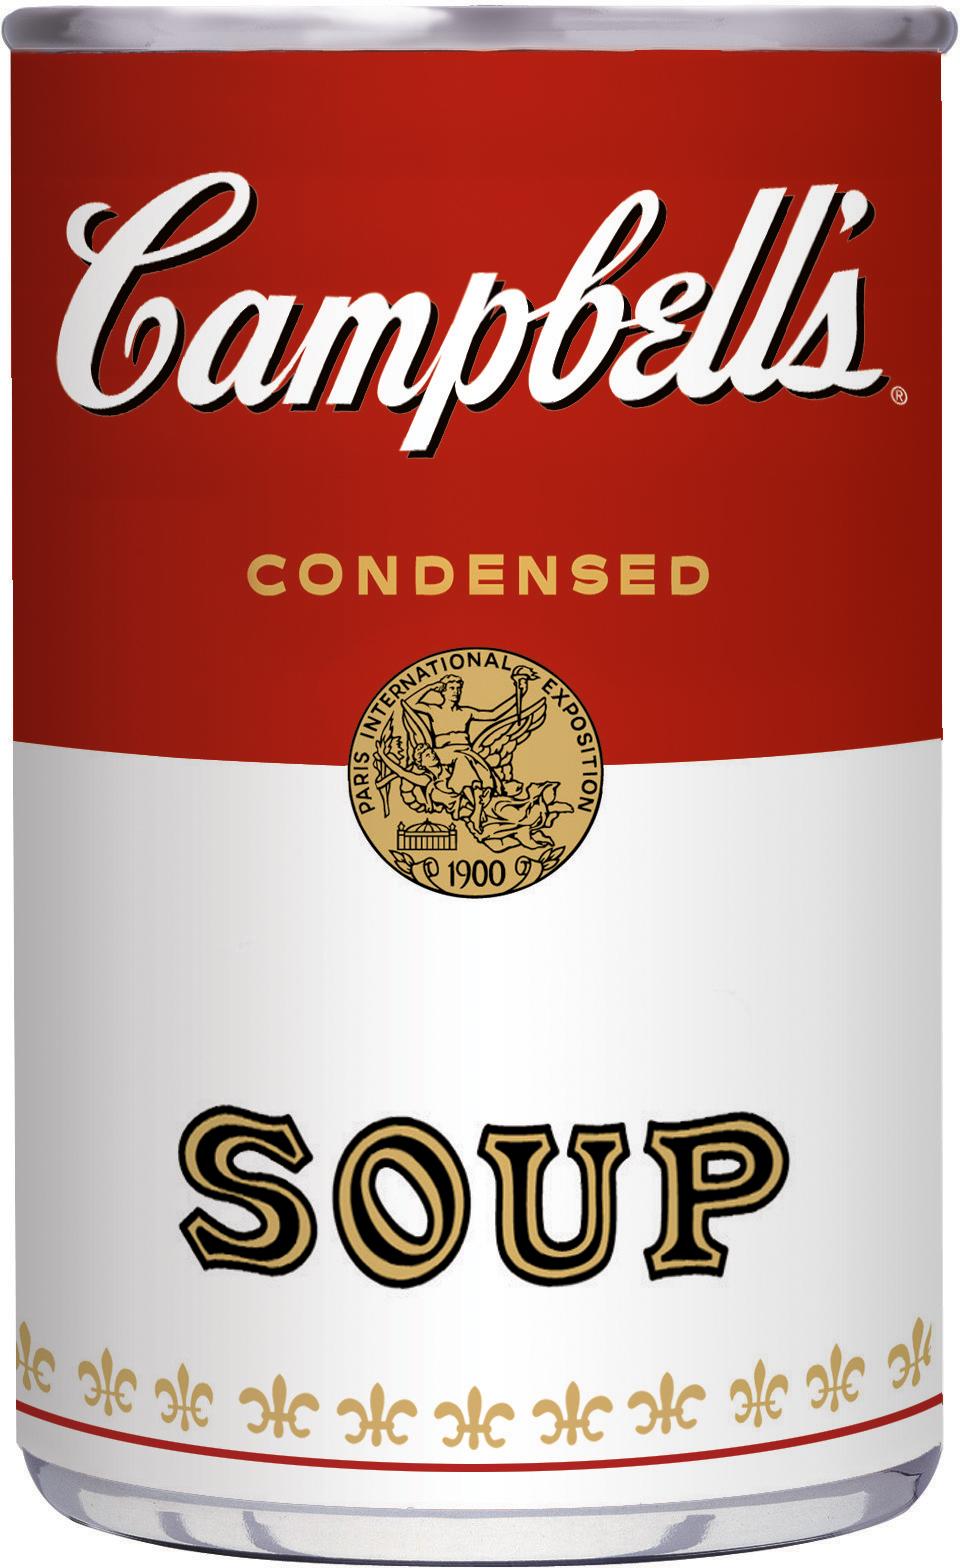 Chicken Soup clipart tomato soup Noodles Noodle and  com/school/HTML/Campbell's%20Labels